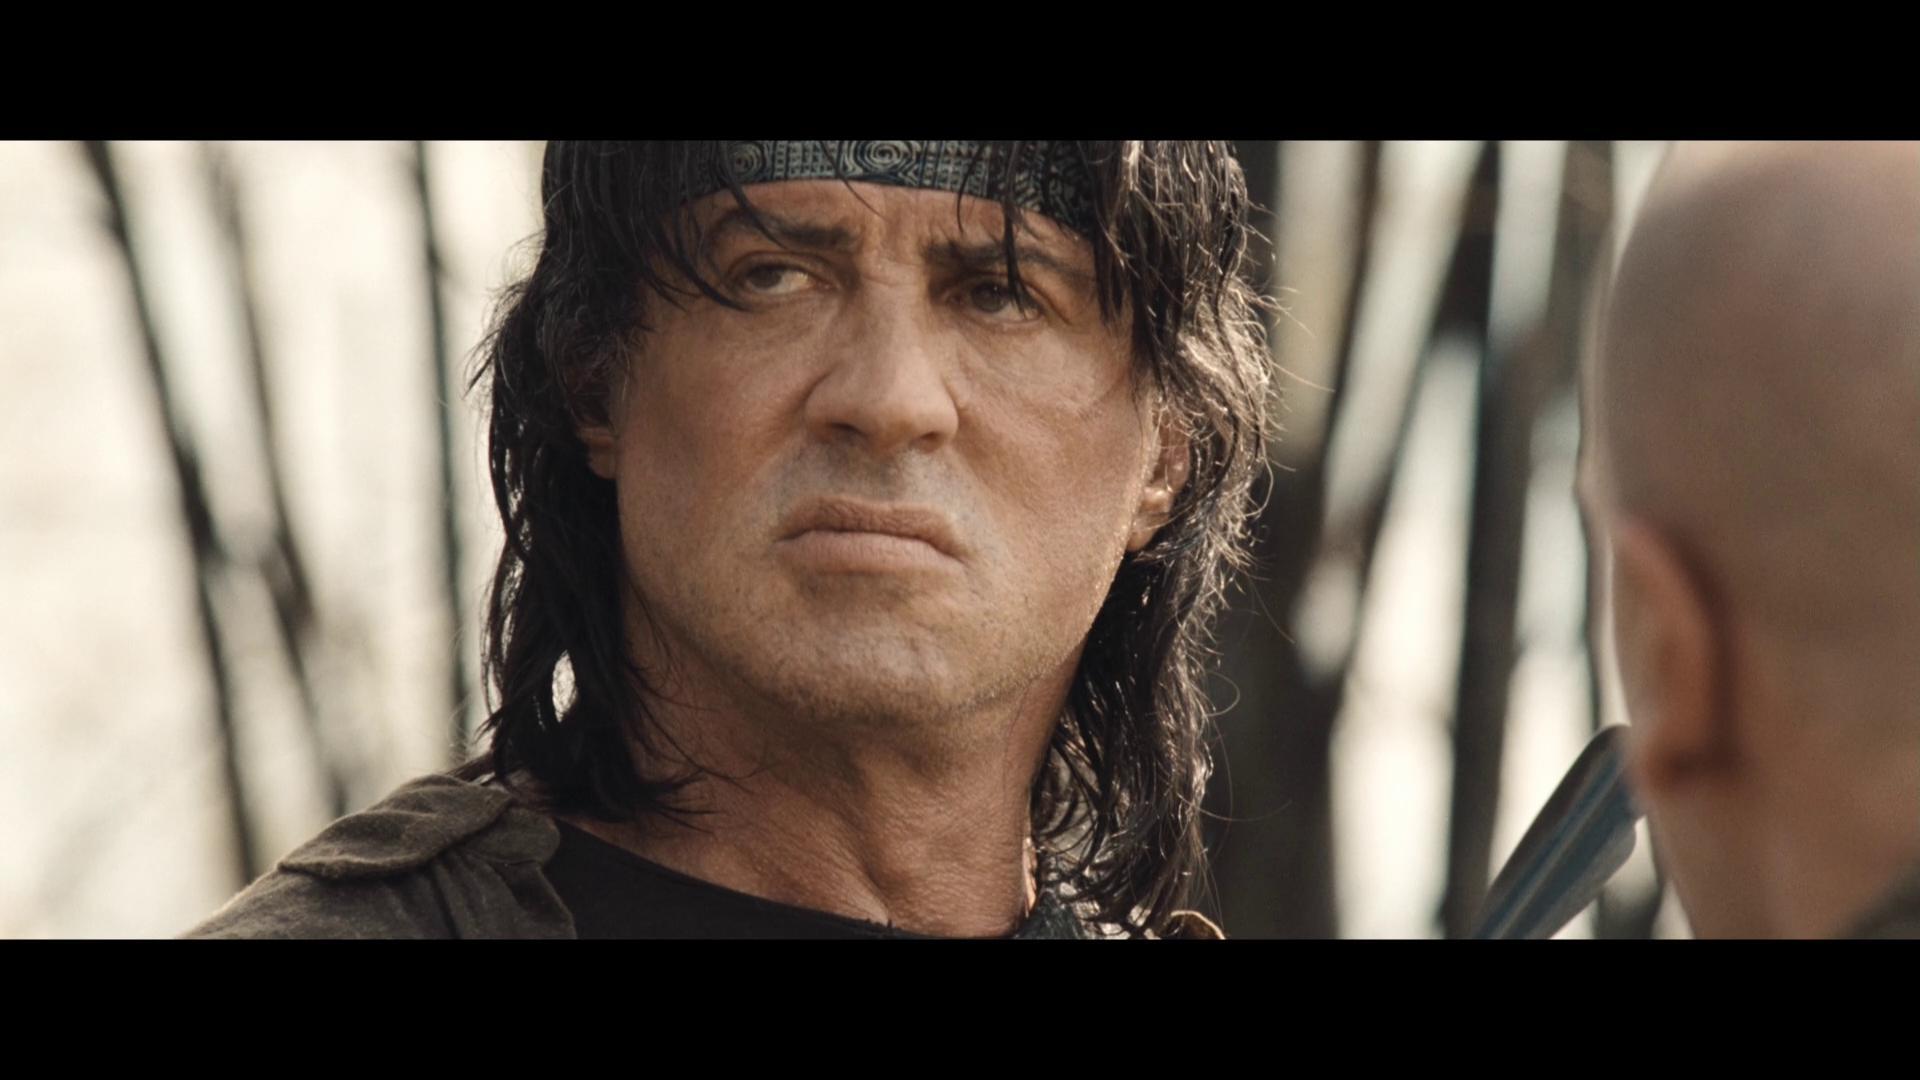 Rambo (2008) - 4K UHD Review - ReDVDit